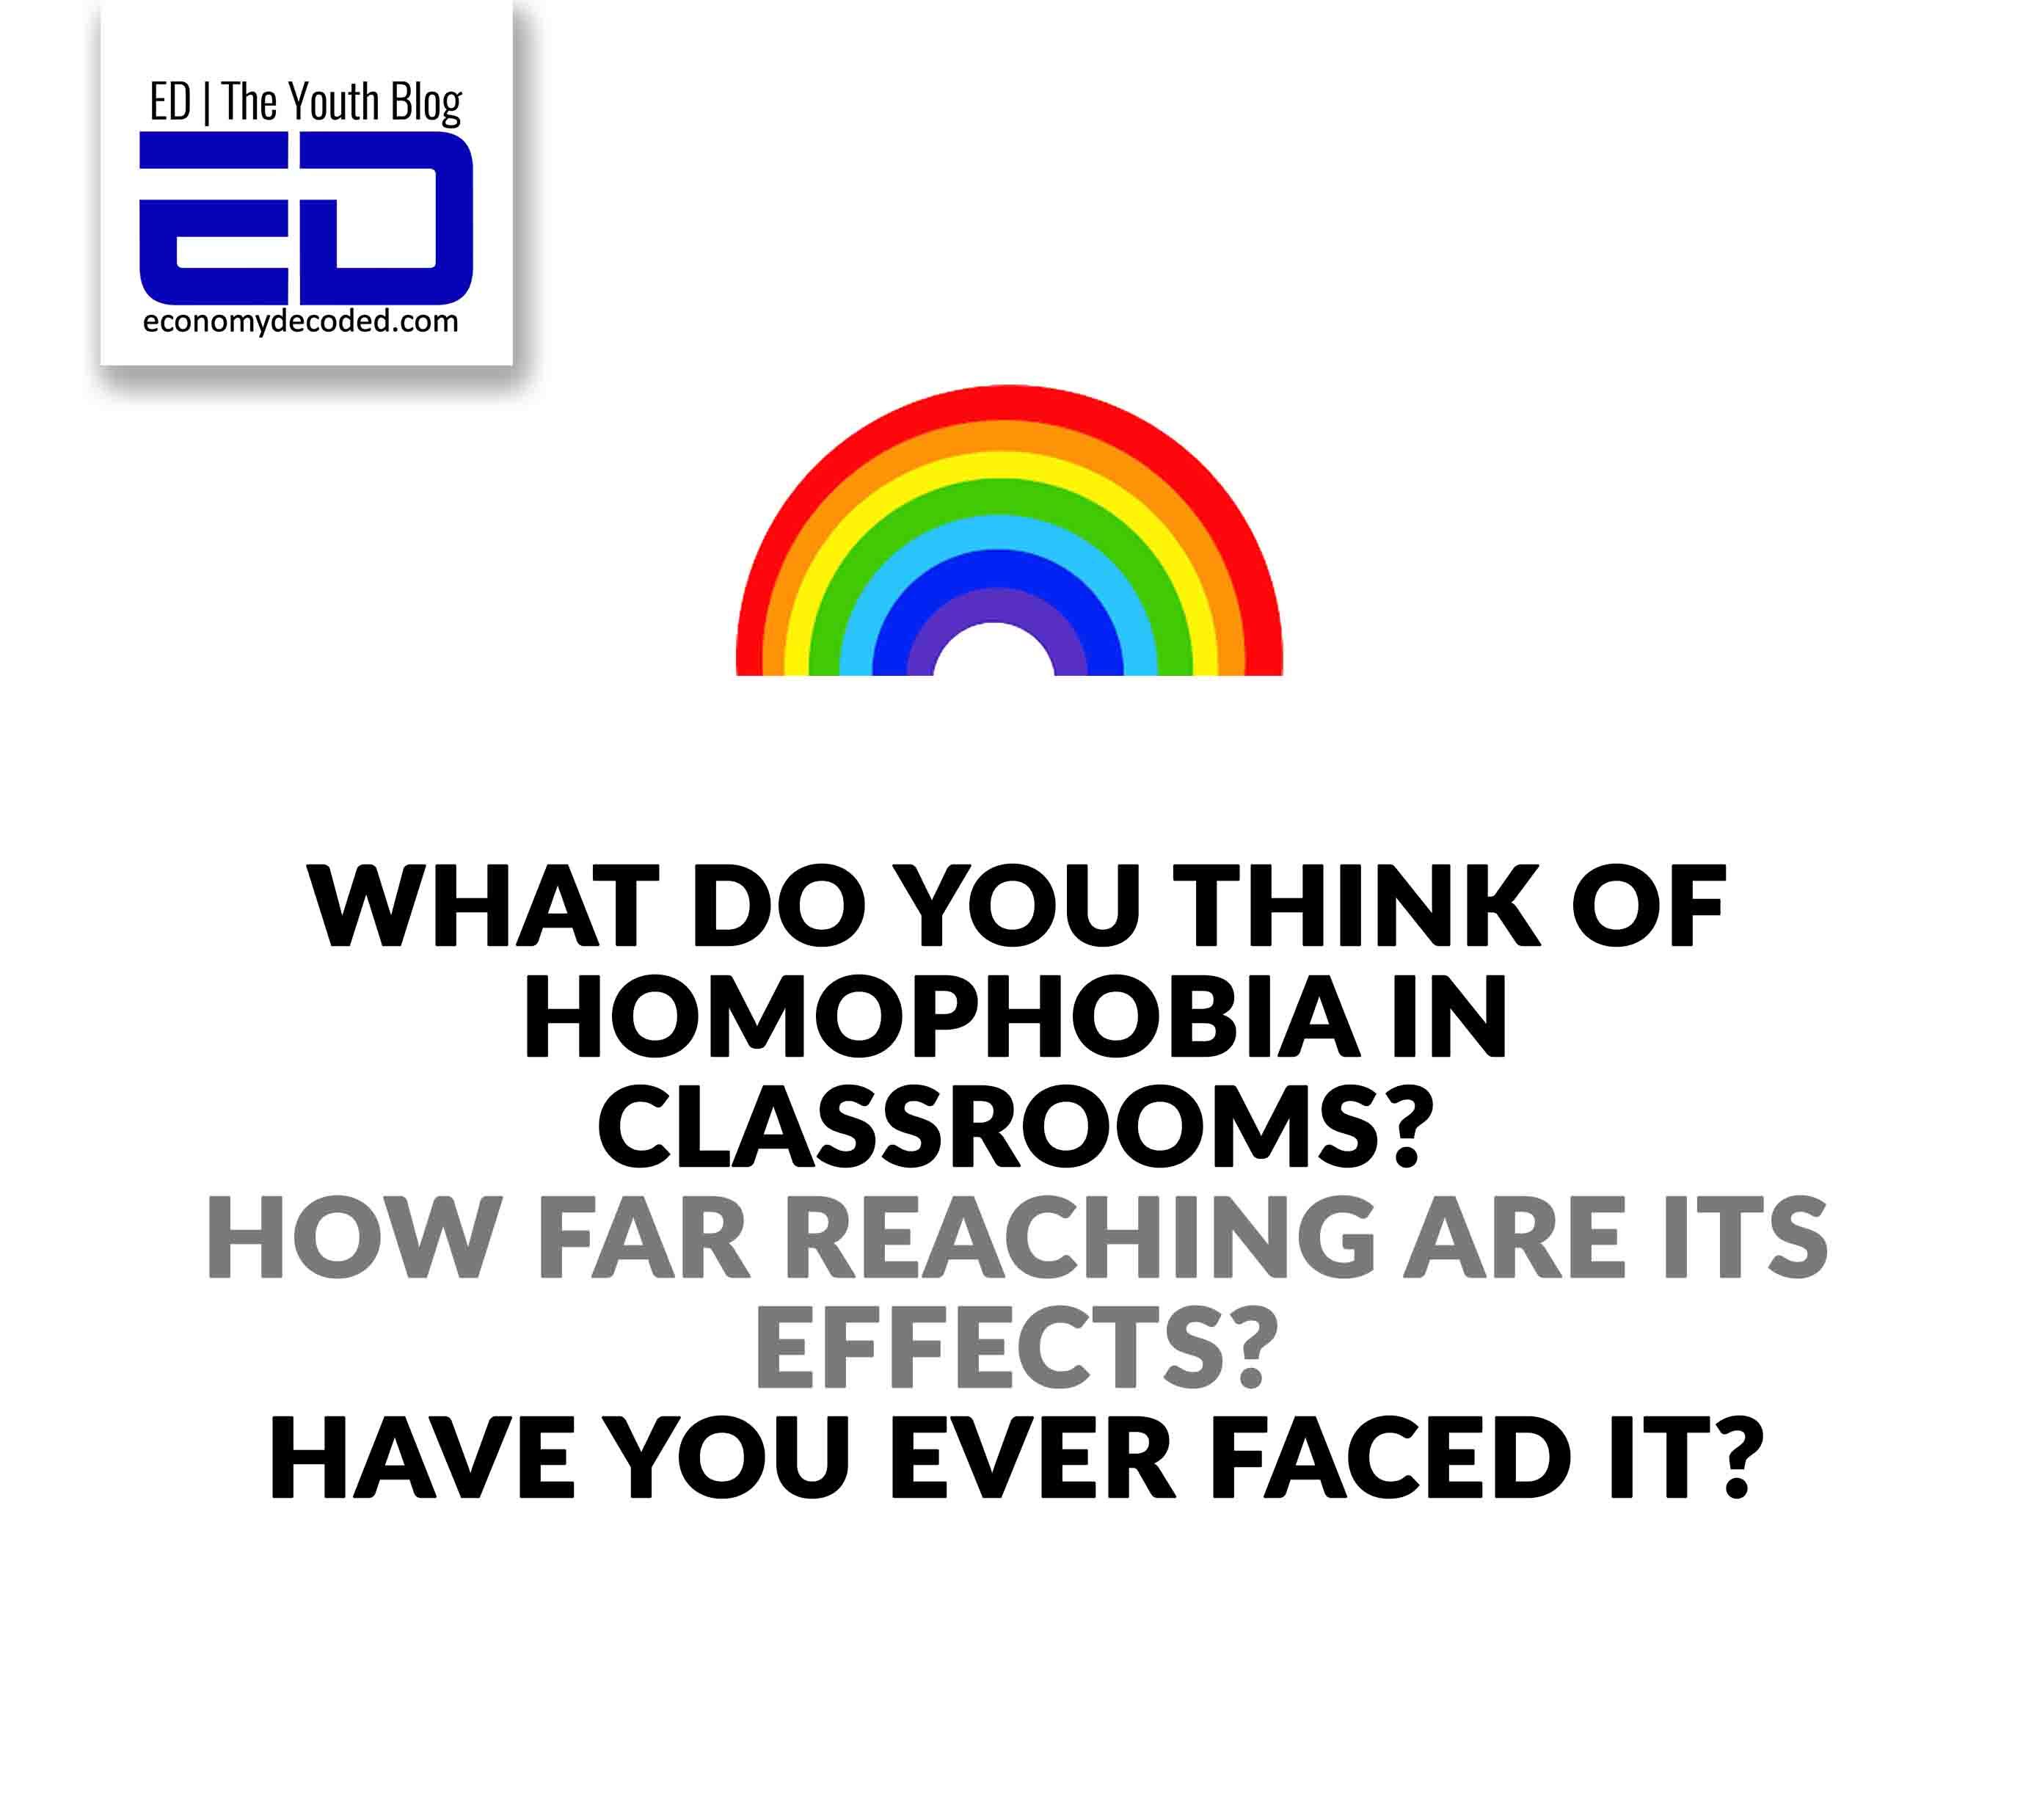 homophobia in classroom